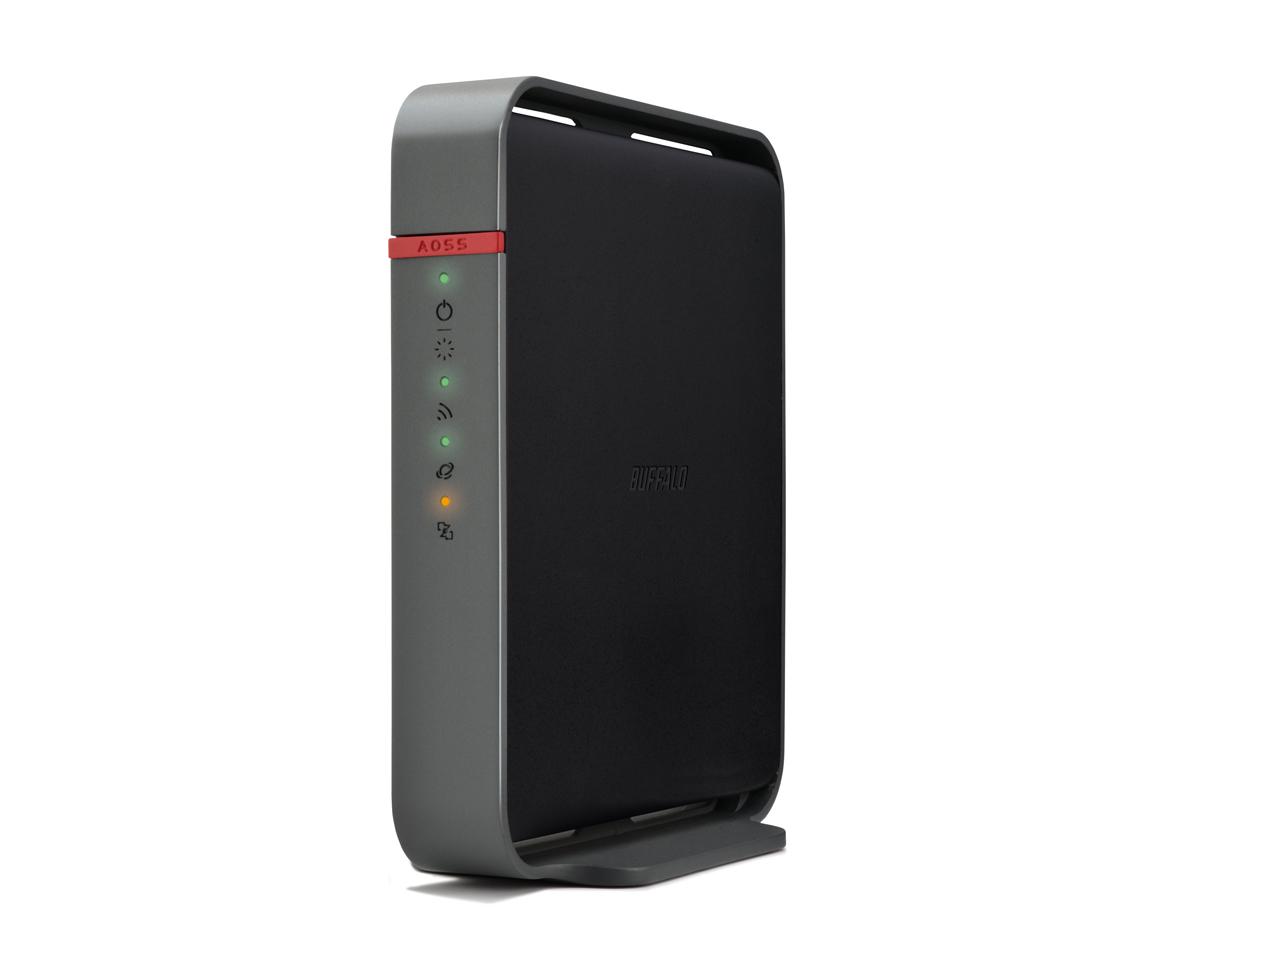 BUFFALO Wireless Router 11n/600Mbps/4 FE LAN Dual Band